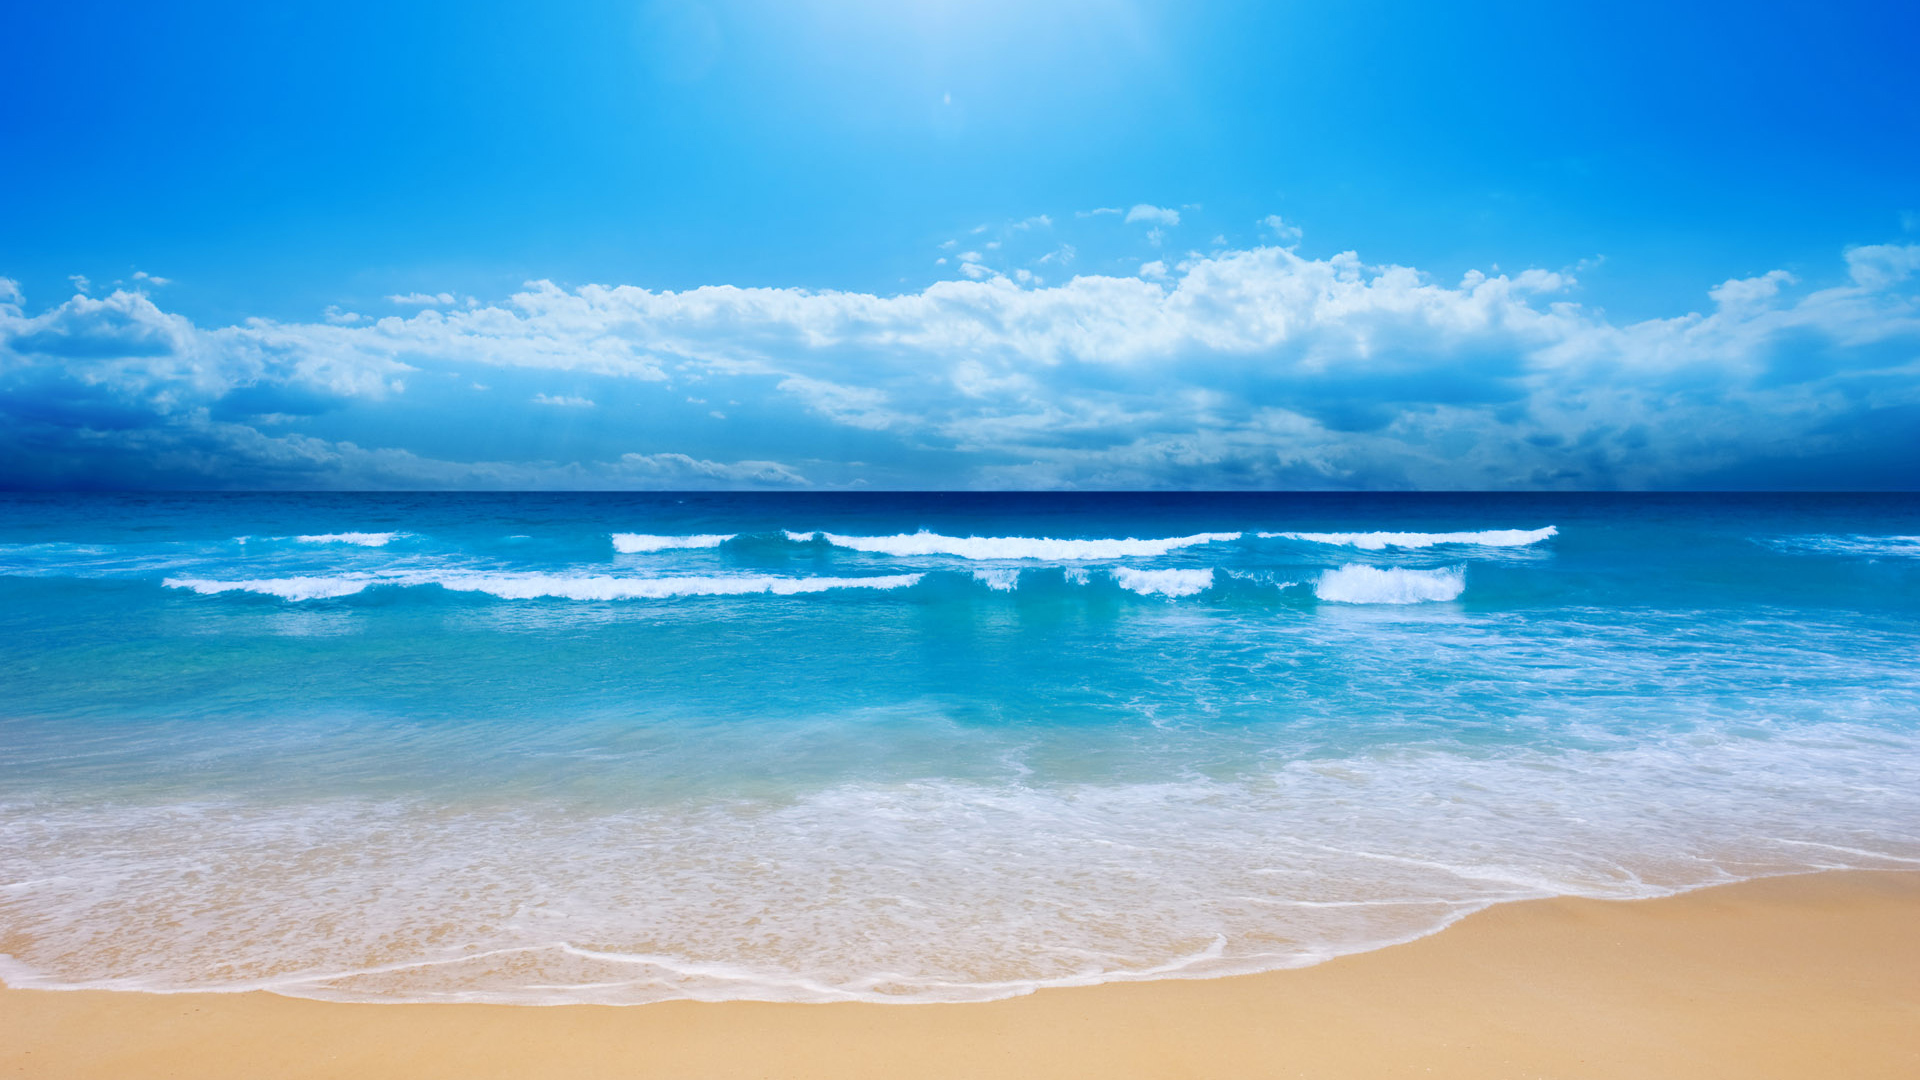 Beautiful Blue Sea Wallpaper Image 607 Wallpaper High Resolution 1920x1080